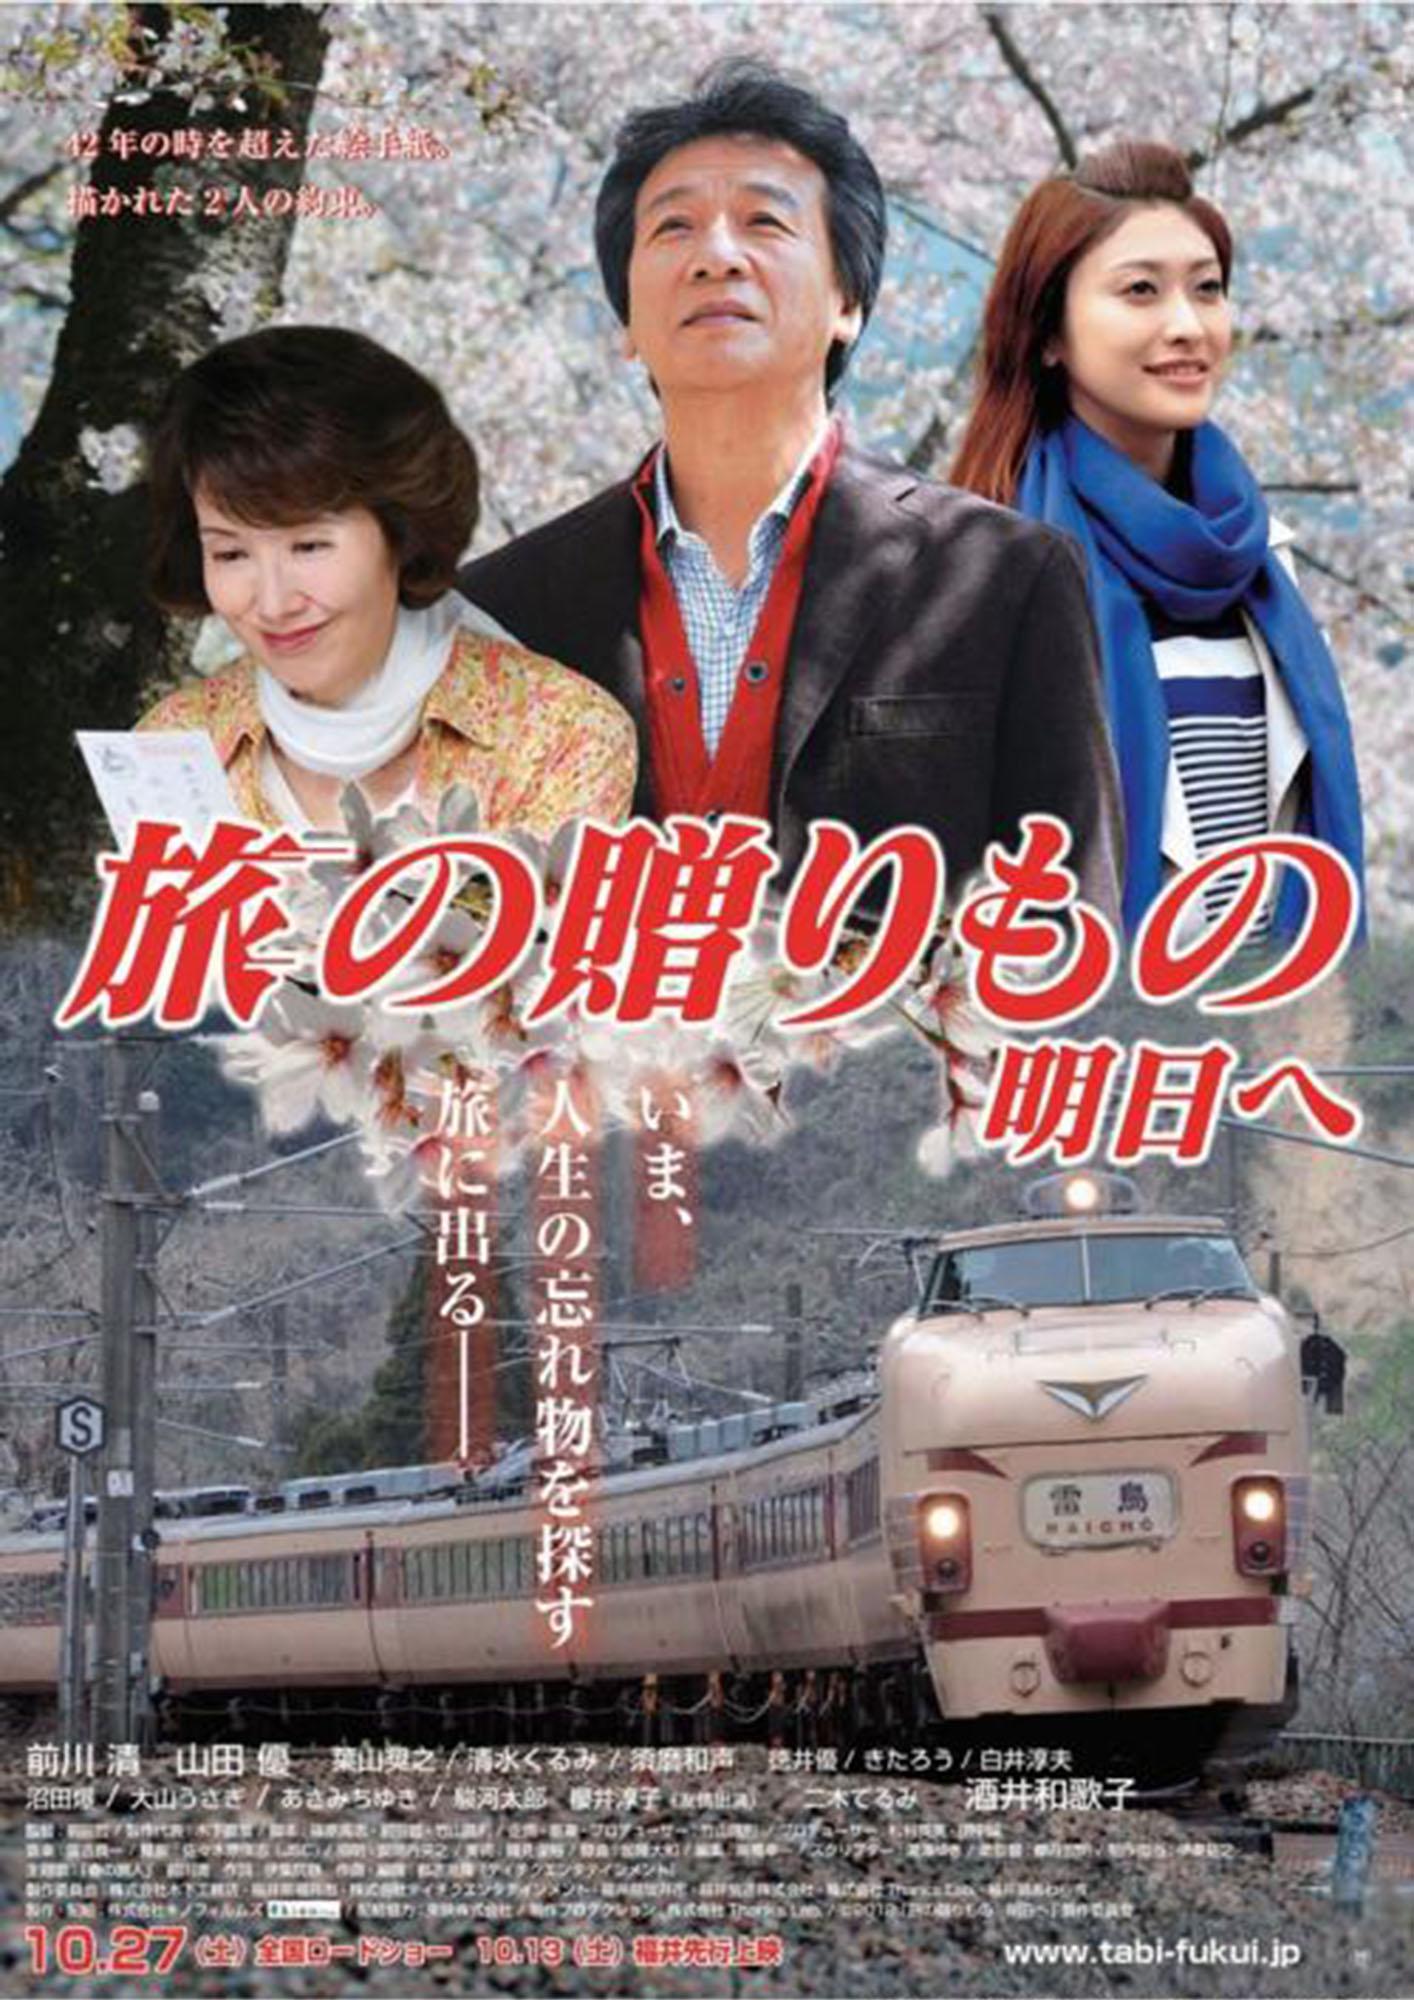 Cosmos Cinema 前川清主演「旅の贈りもの 明日へ」